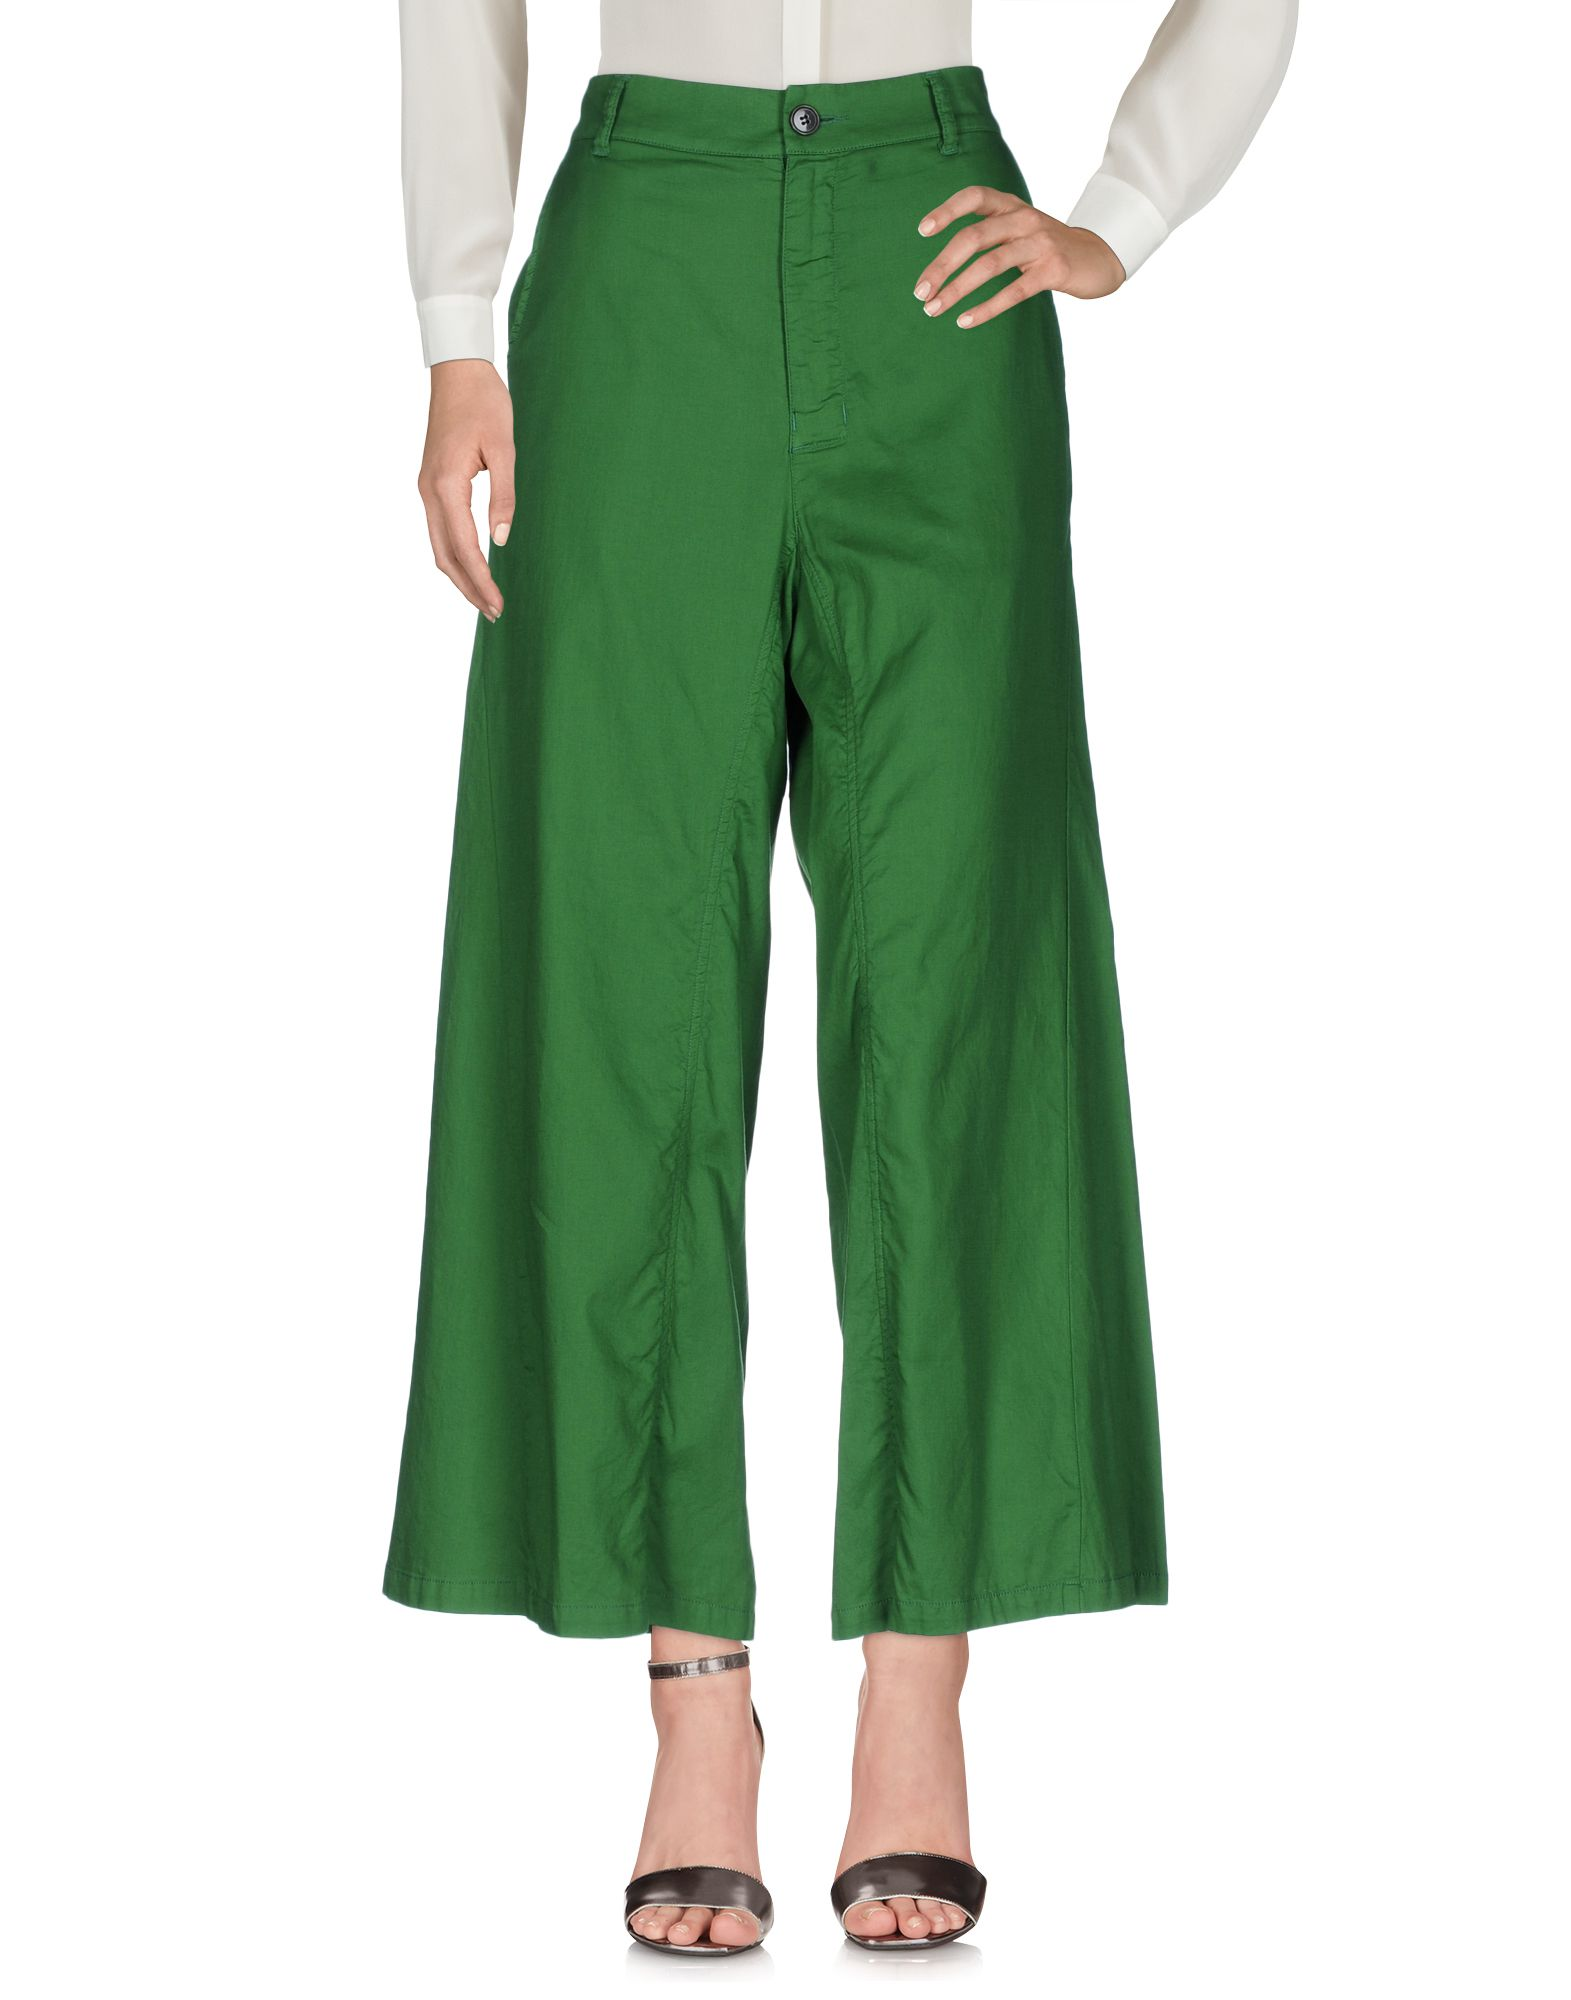 Pantalone Zucca Donna - Acquista online su F3AubtIux